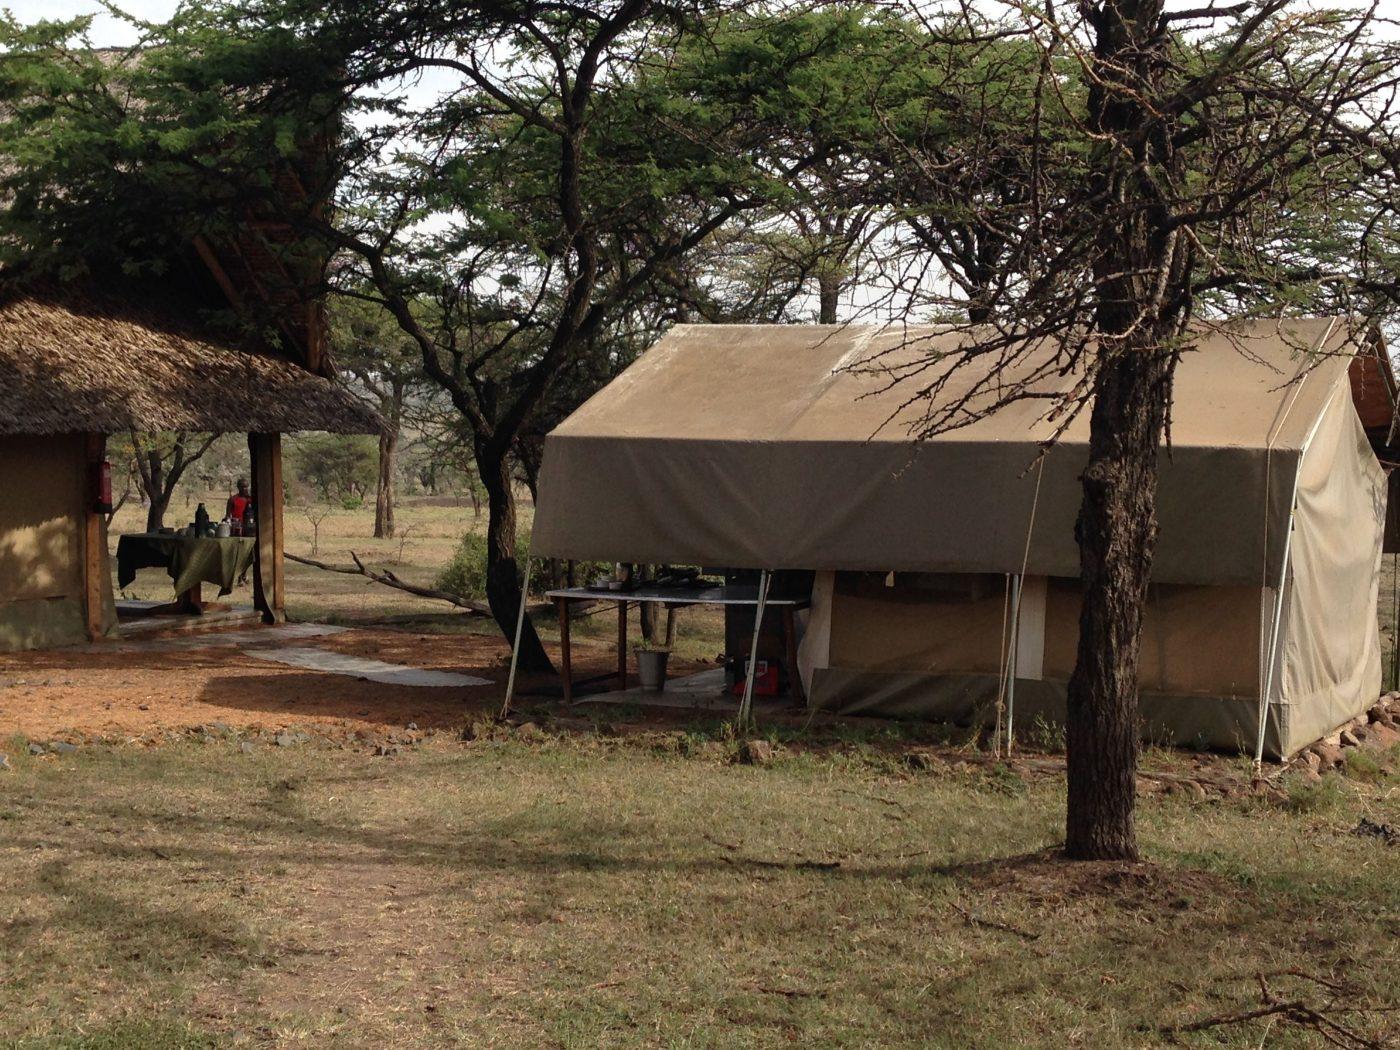 Safari Lodges in Kenya: Naboisho Camp Tent from outside